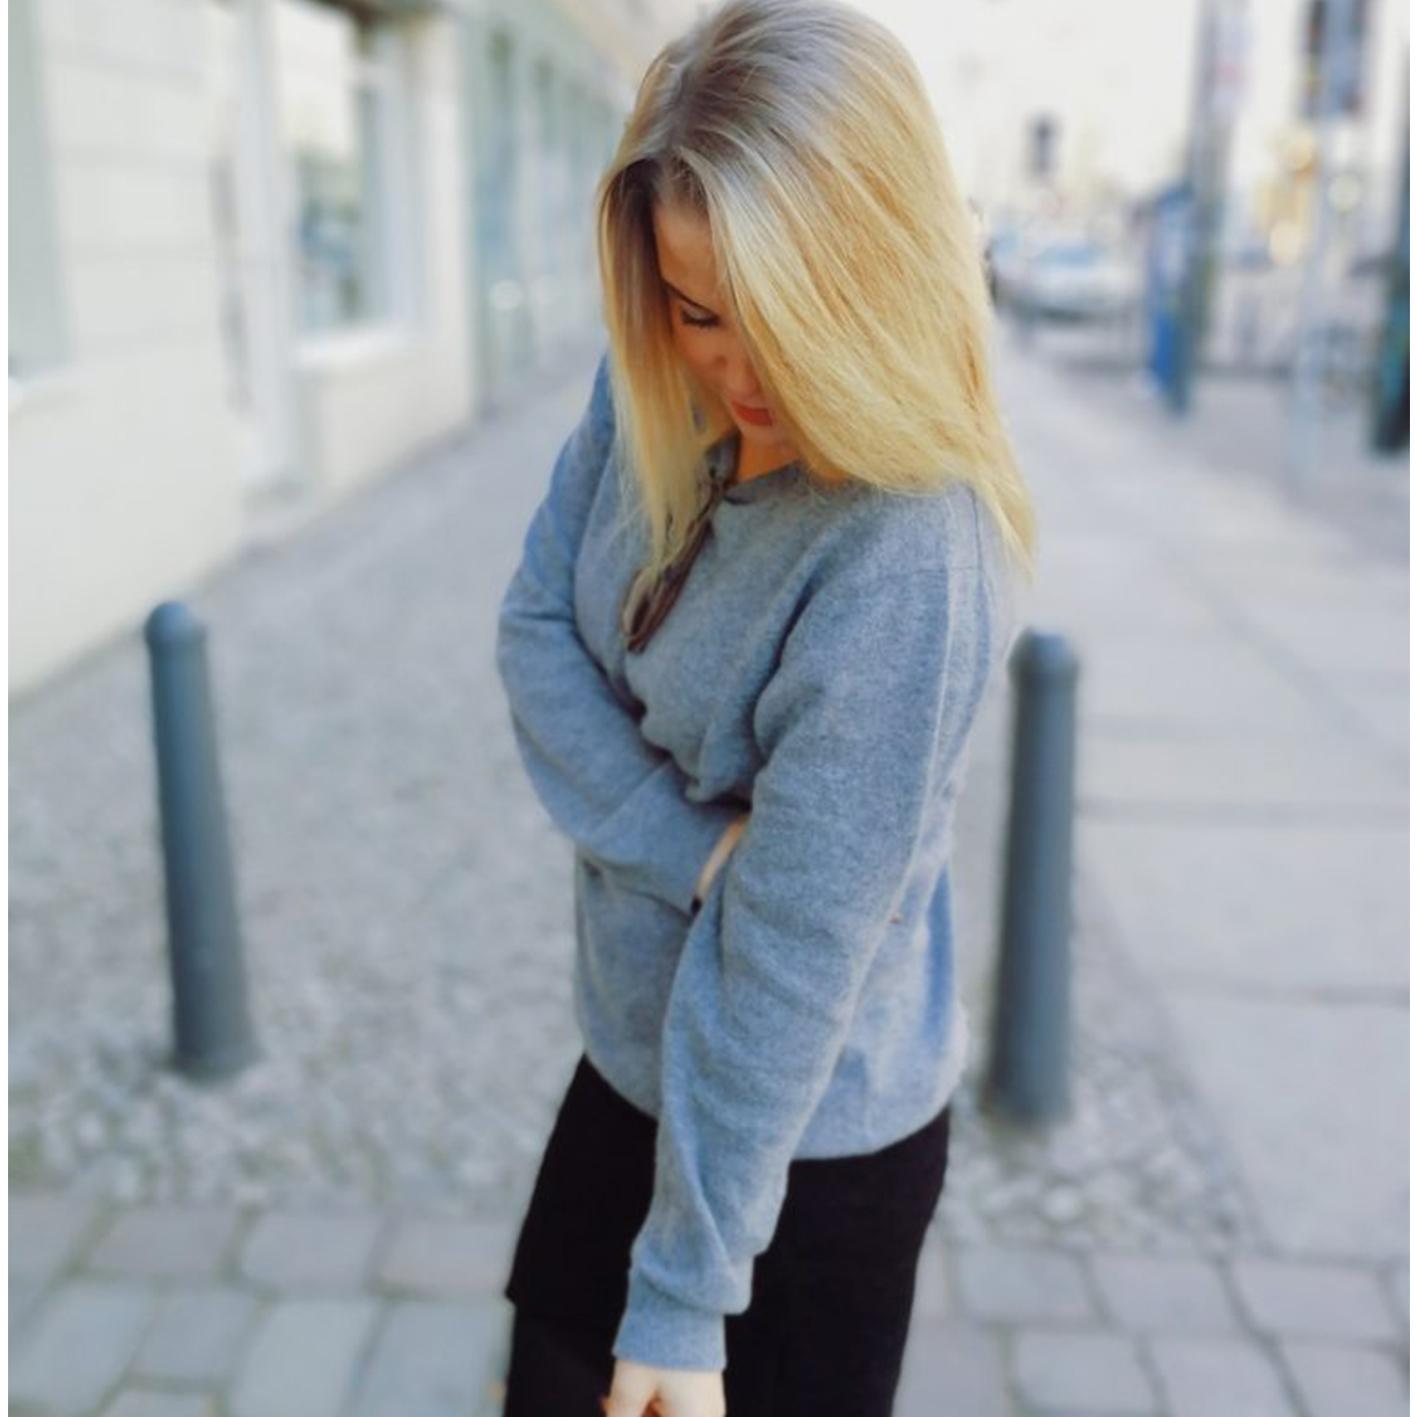 Regitse Rosenvinge i vores bløde cashmere bluse fra hendes blog The Copenhagen Traveler